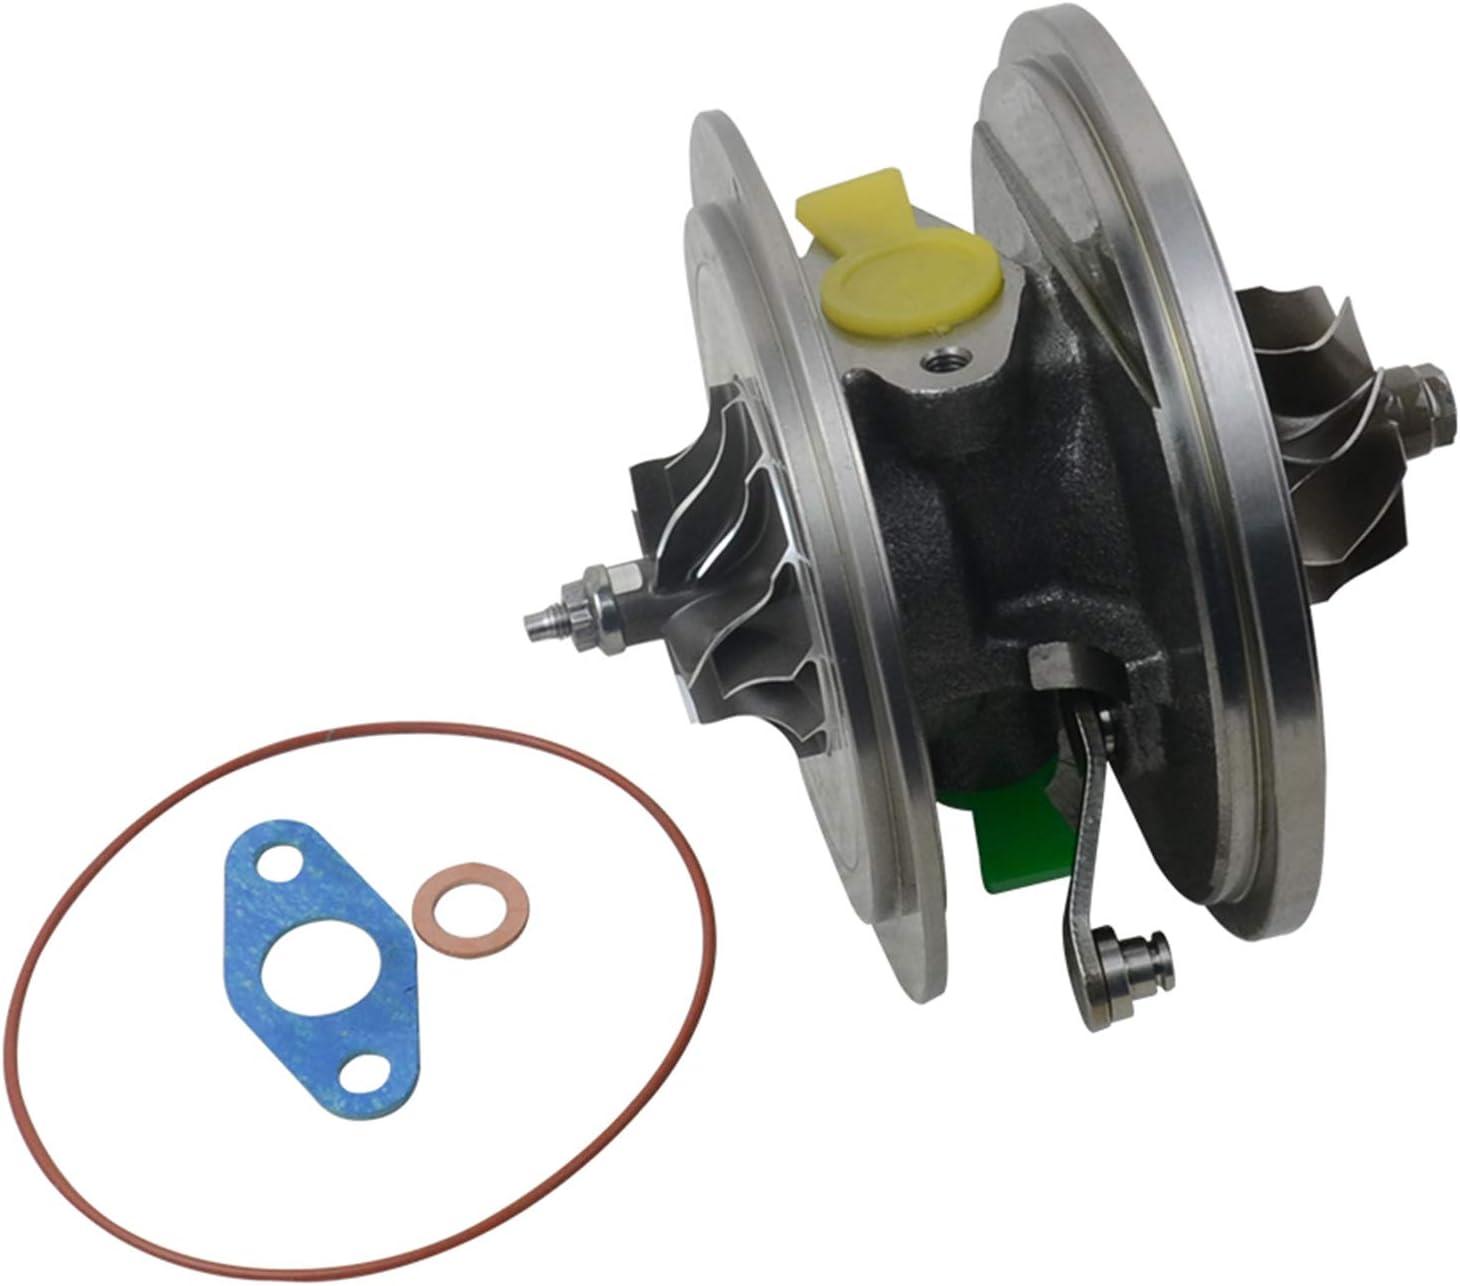 SCSN Turbo CHRA Cartucho BK2Q6K682GA 1741779